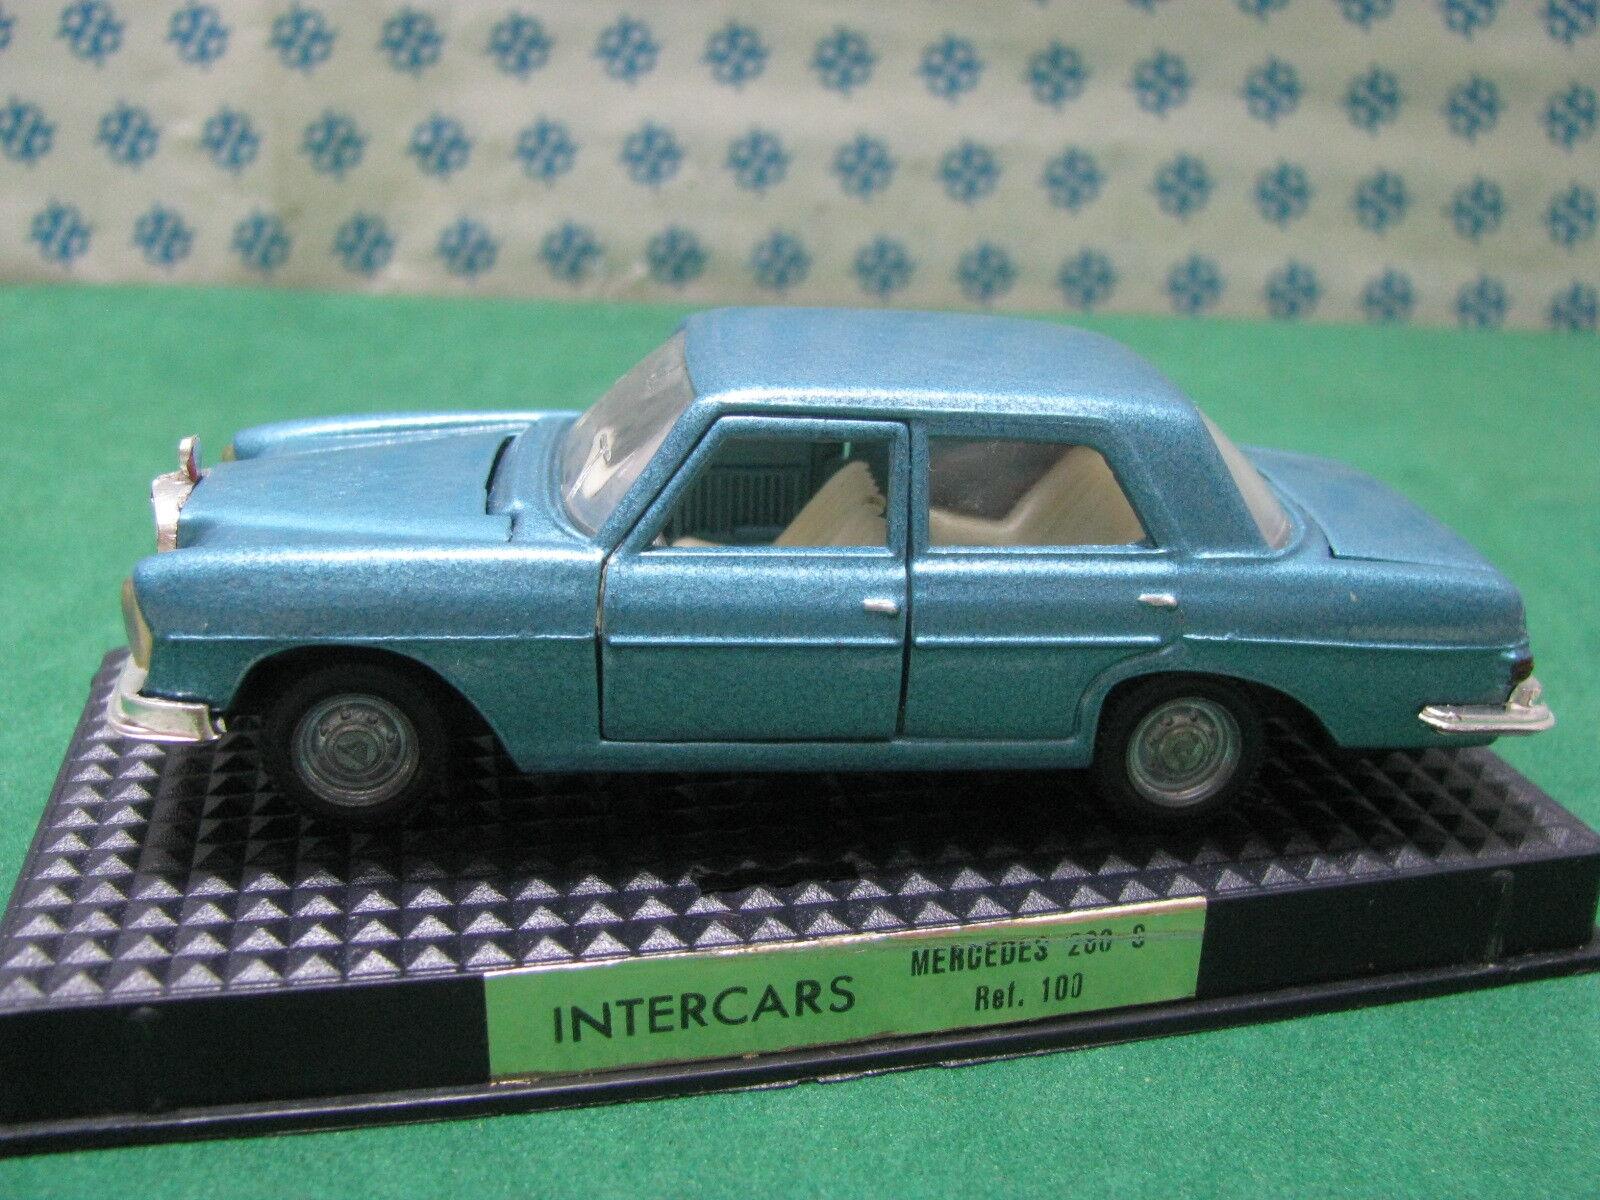 Vintage - Mercedes-Benz 280 S - 1 43 Nacoral S. A.Ref.100